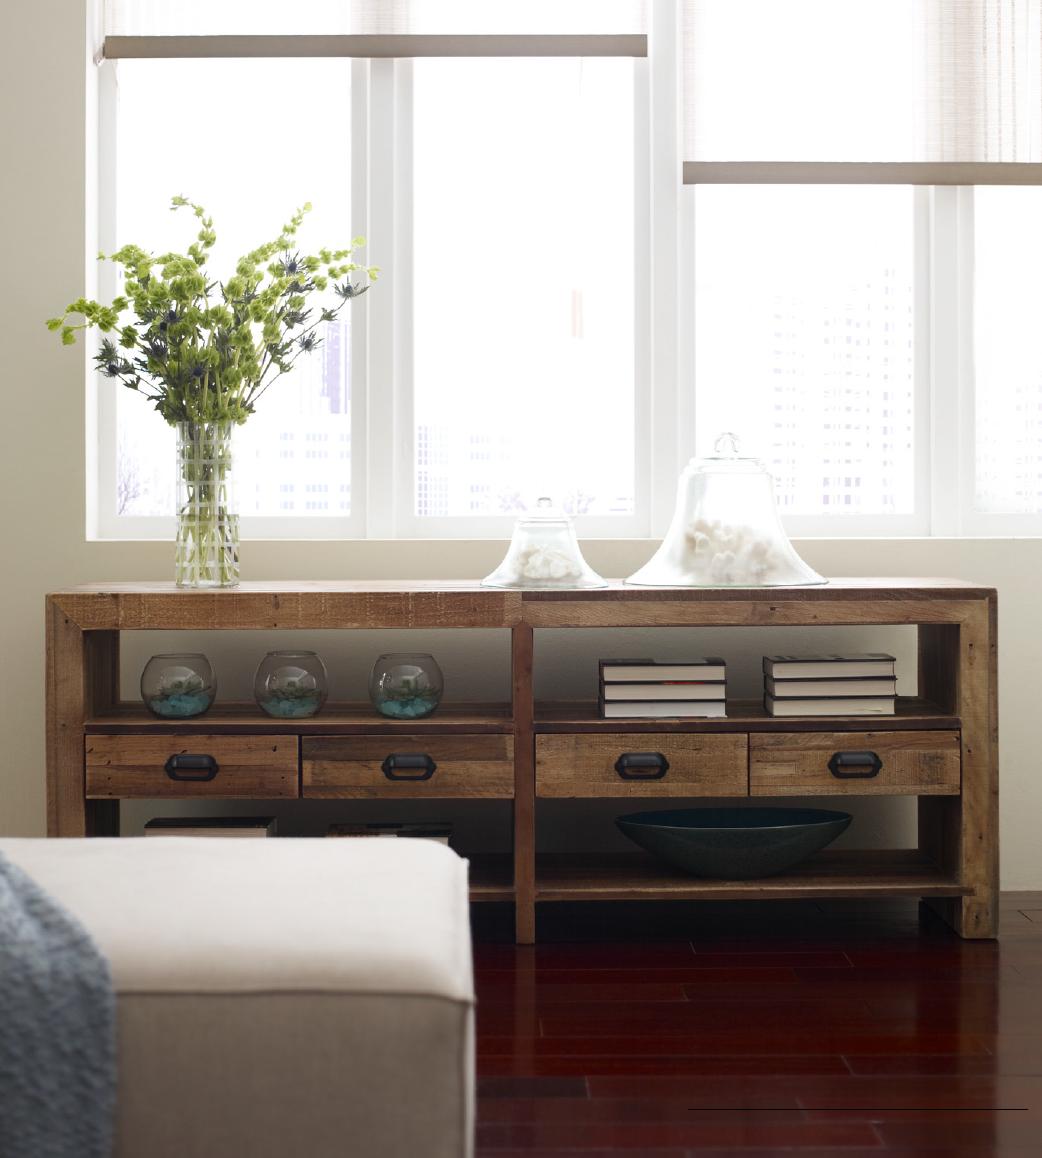 angora reclaimed wood rustic tv media console - Reclaimed Wood Media Console